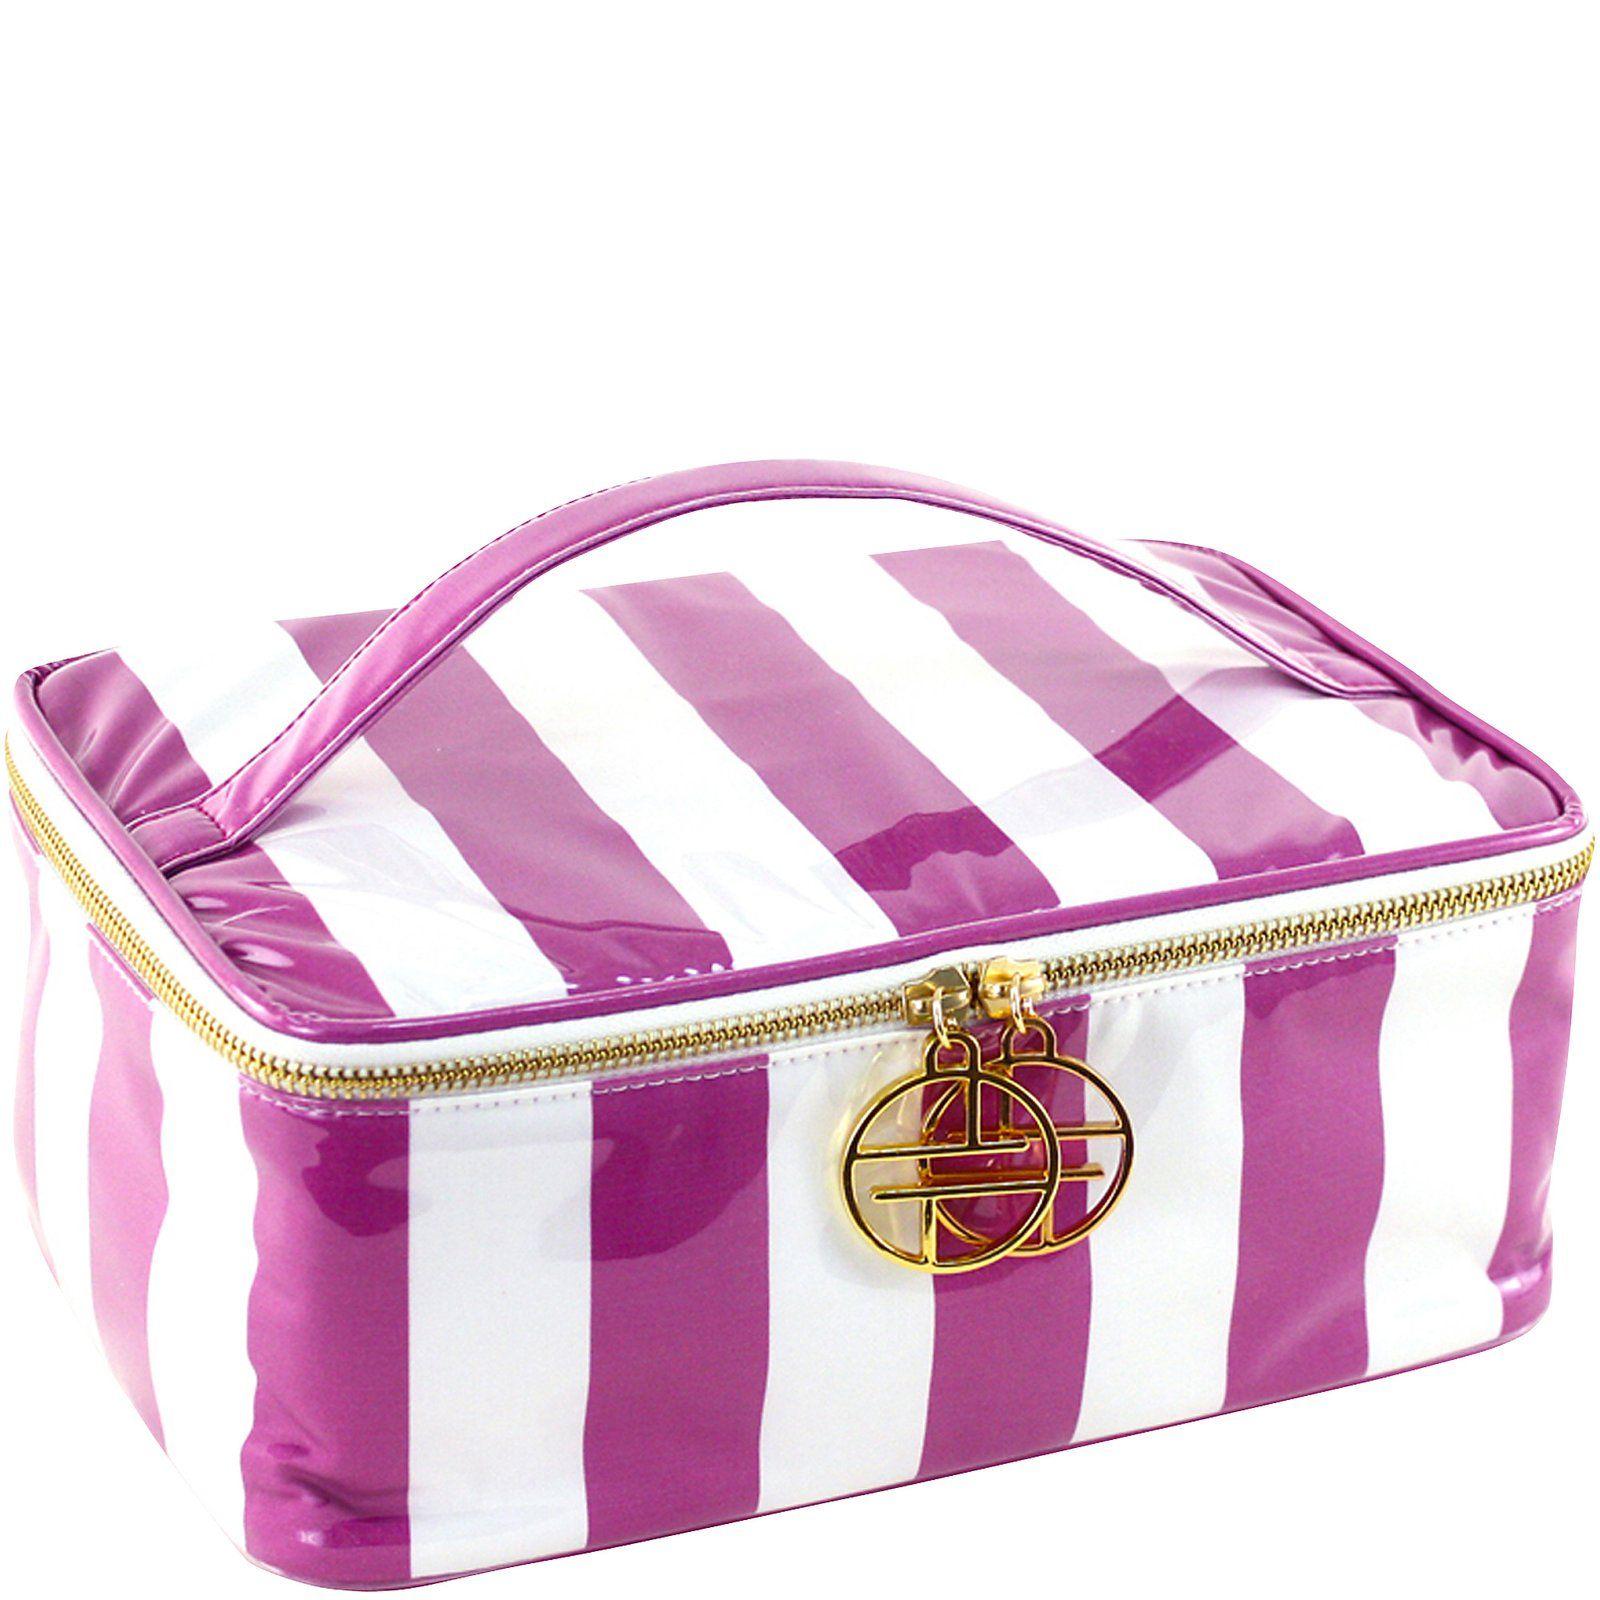 Trina Cosmetic Bags Travel Accessories Essential Train Case 3